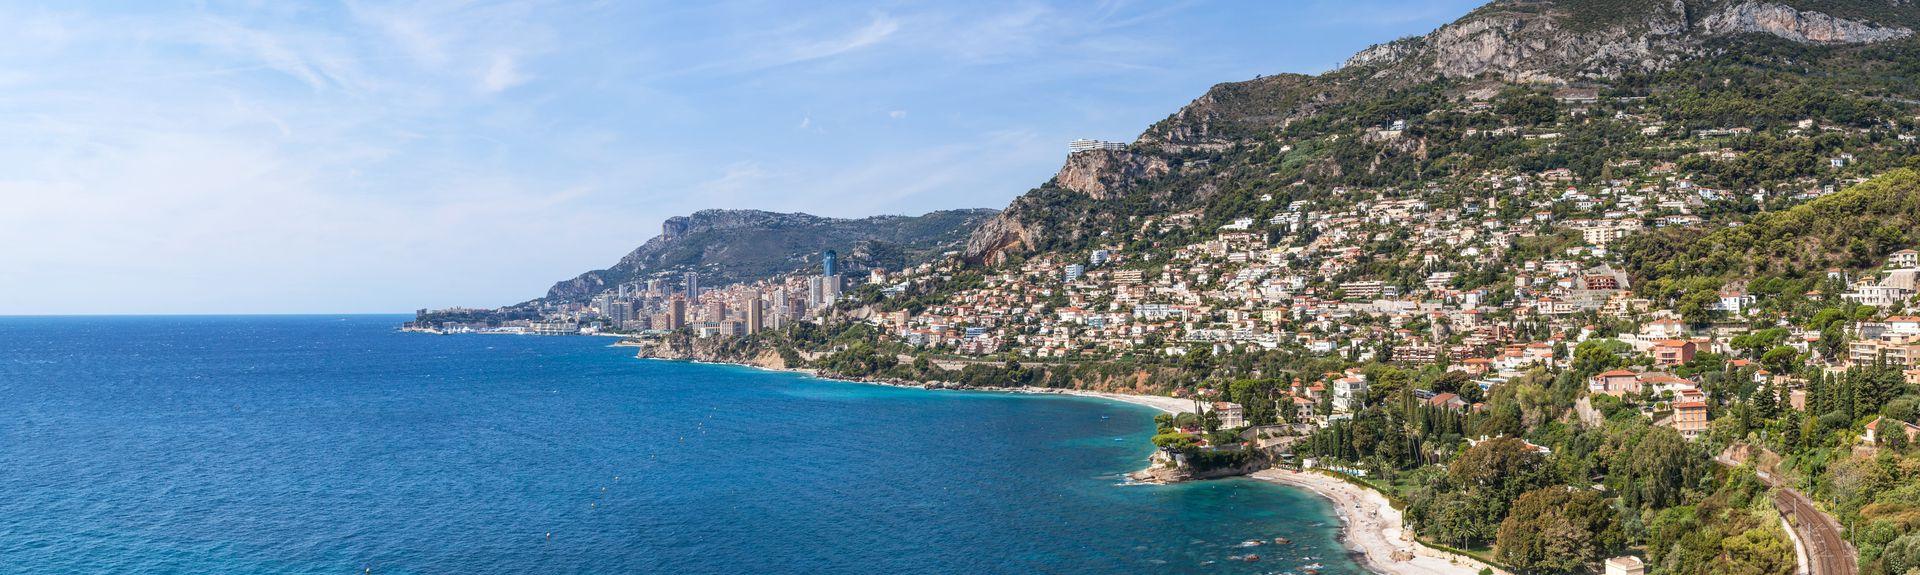 Roquebrune-Cap-Martin, Provence-Alpes-Côte d'Azur, Frankrike